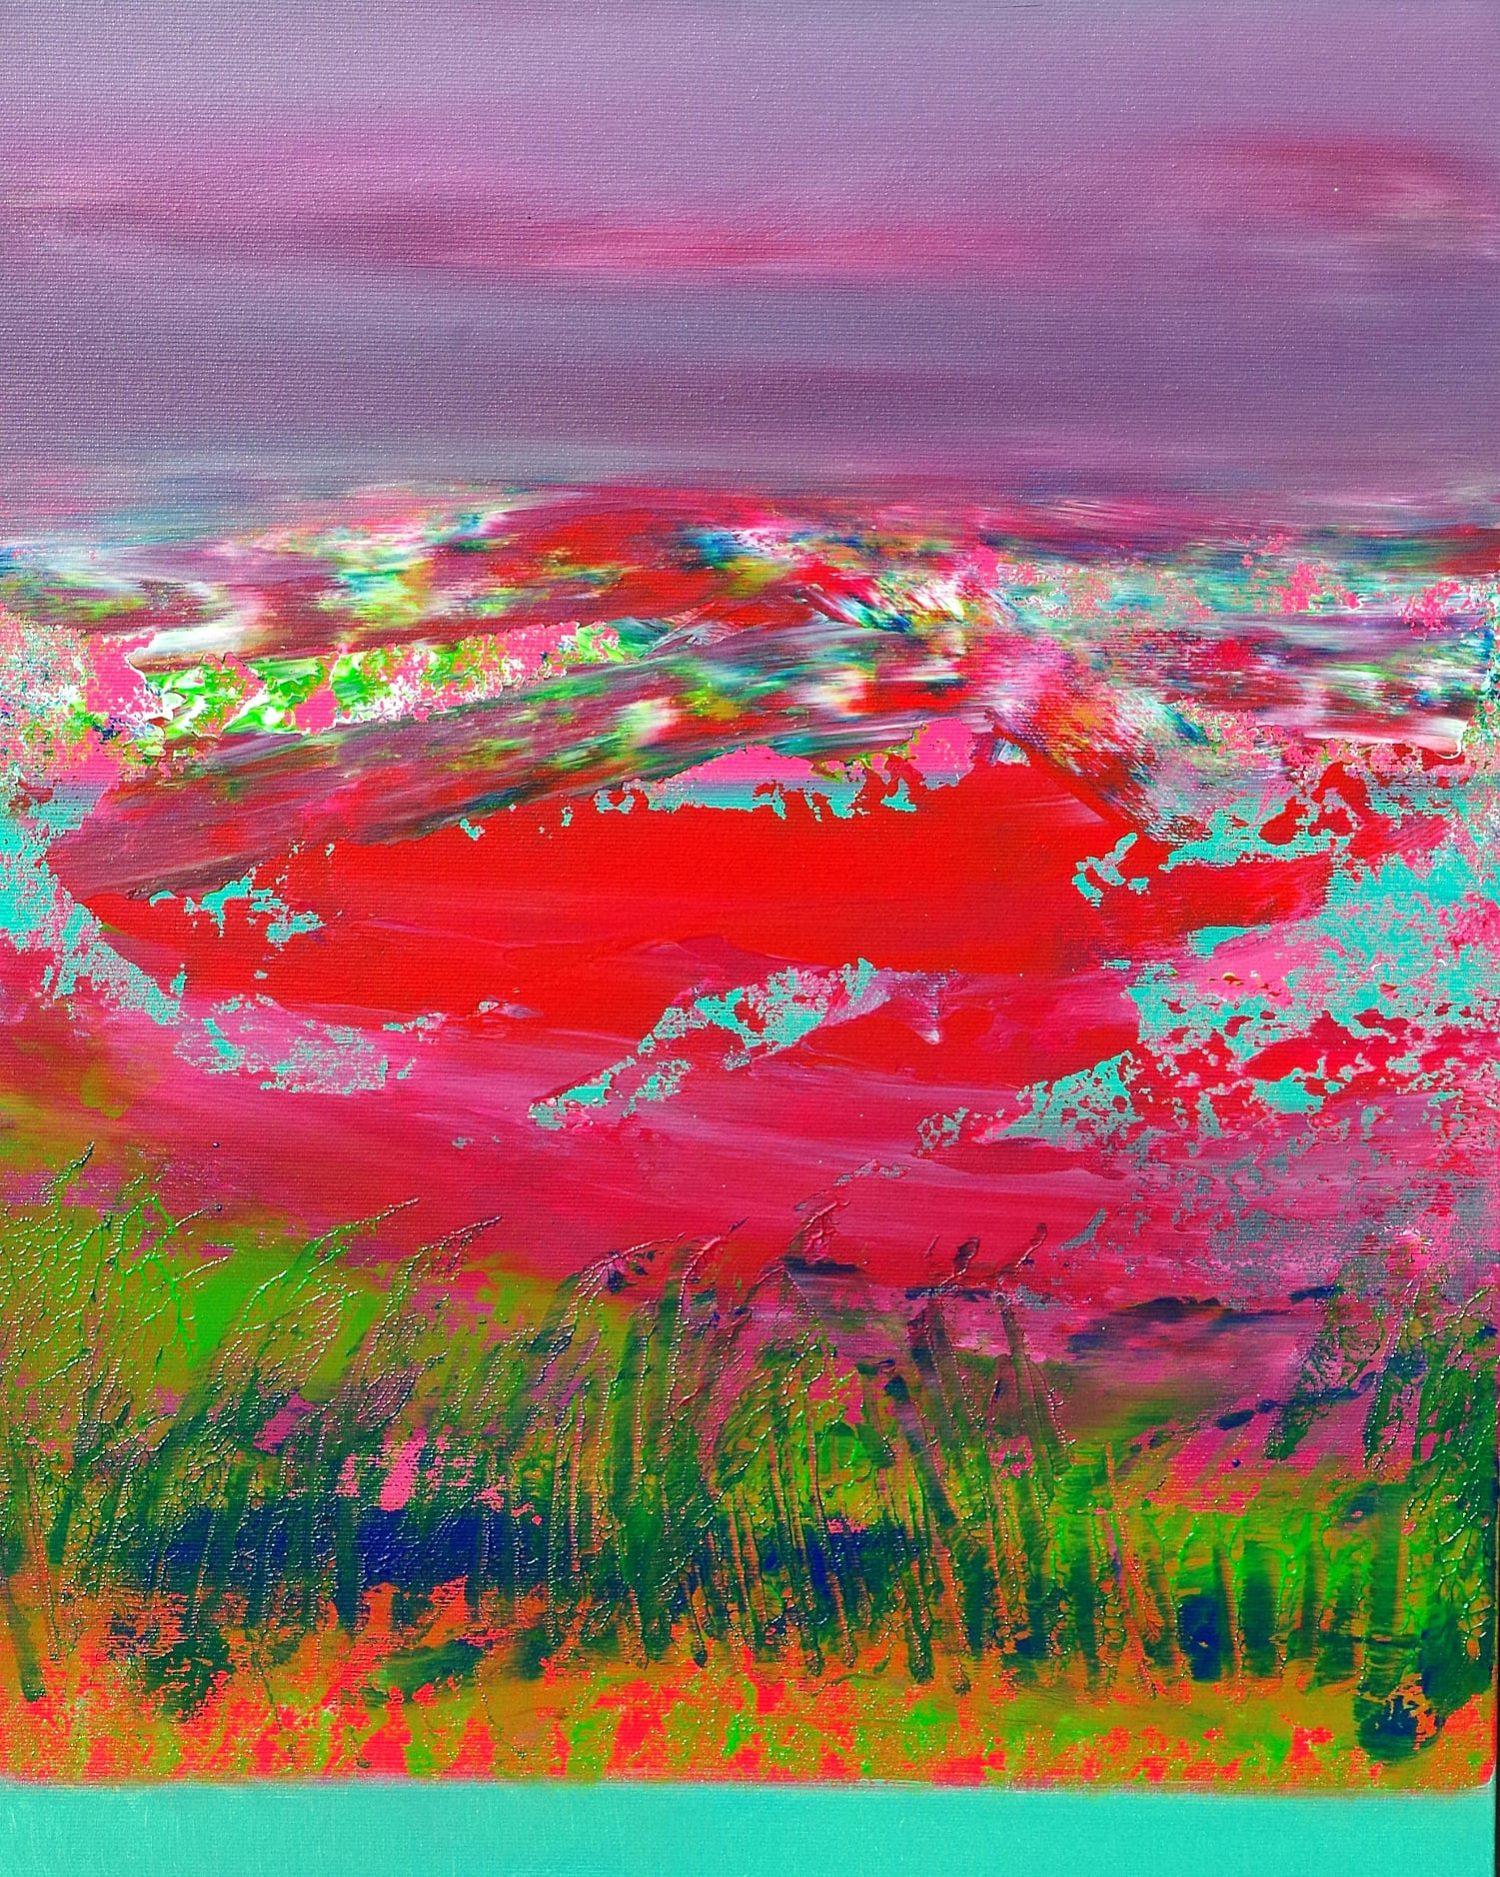 Horizons, 3 40x50 acrylic_quadro astratto in vendita online